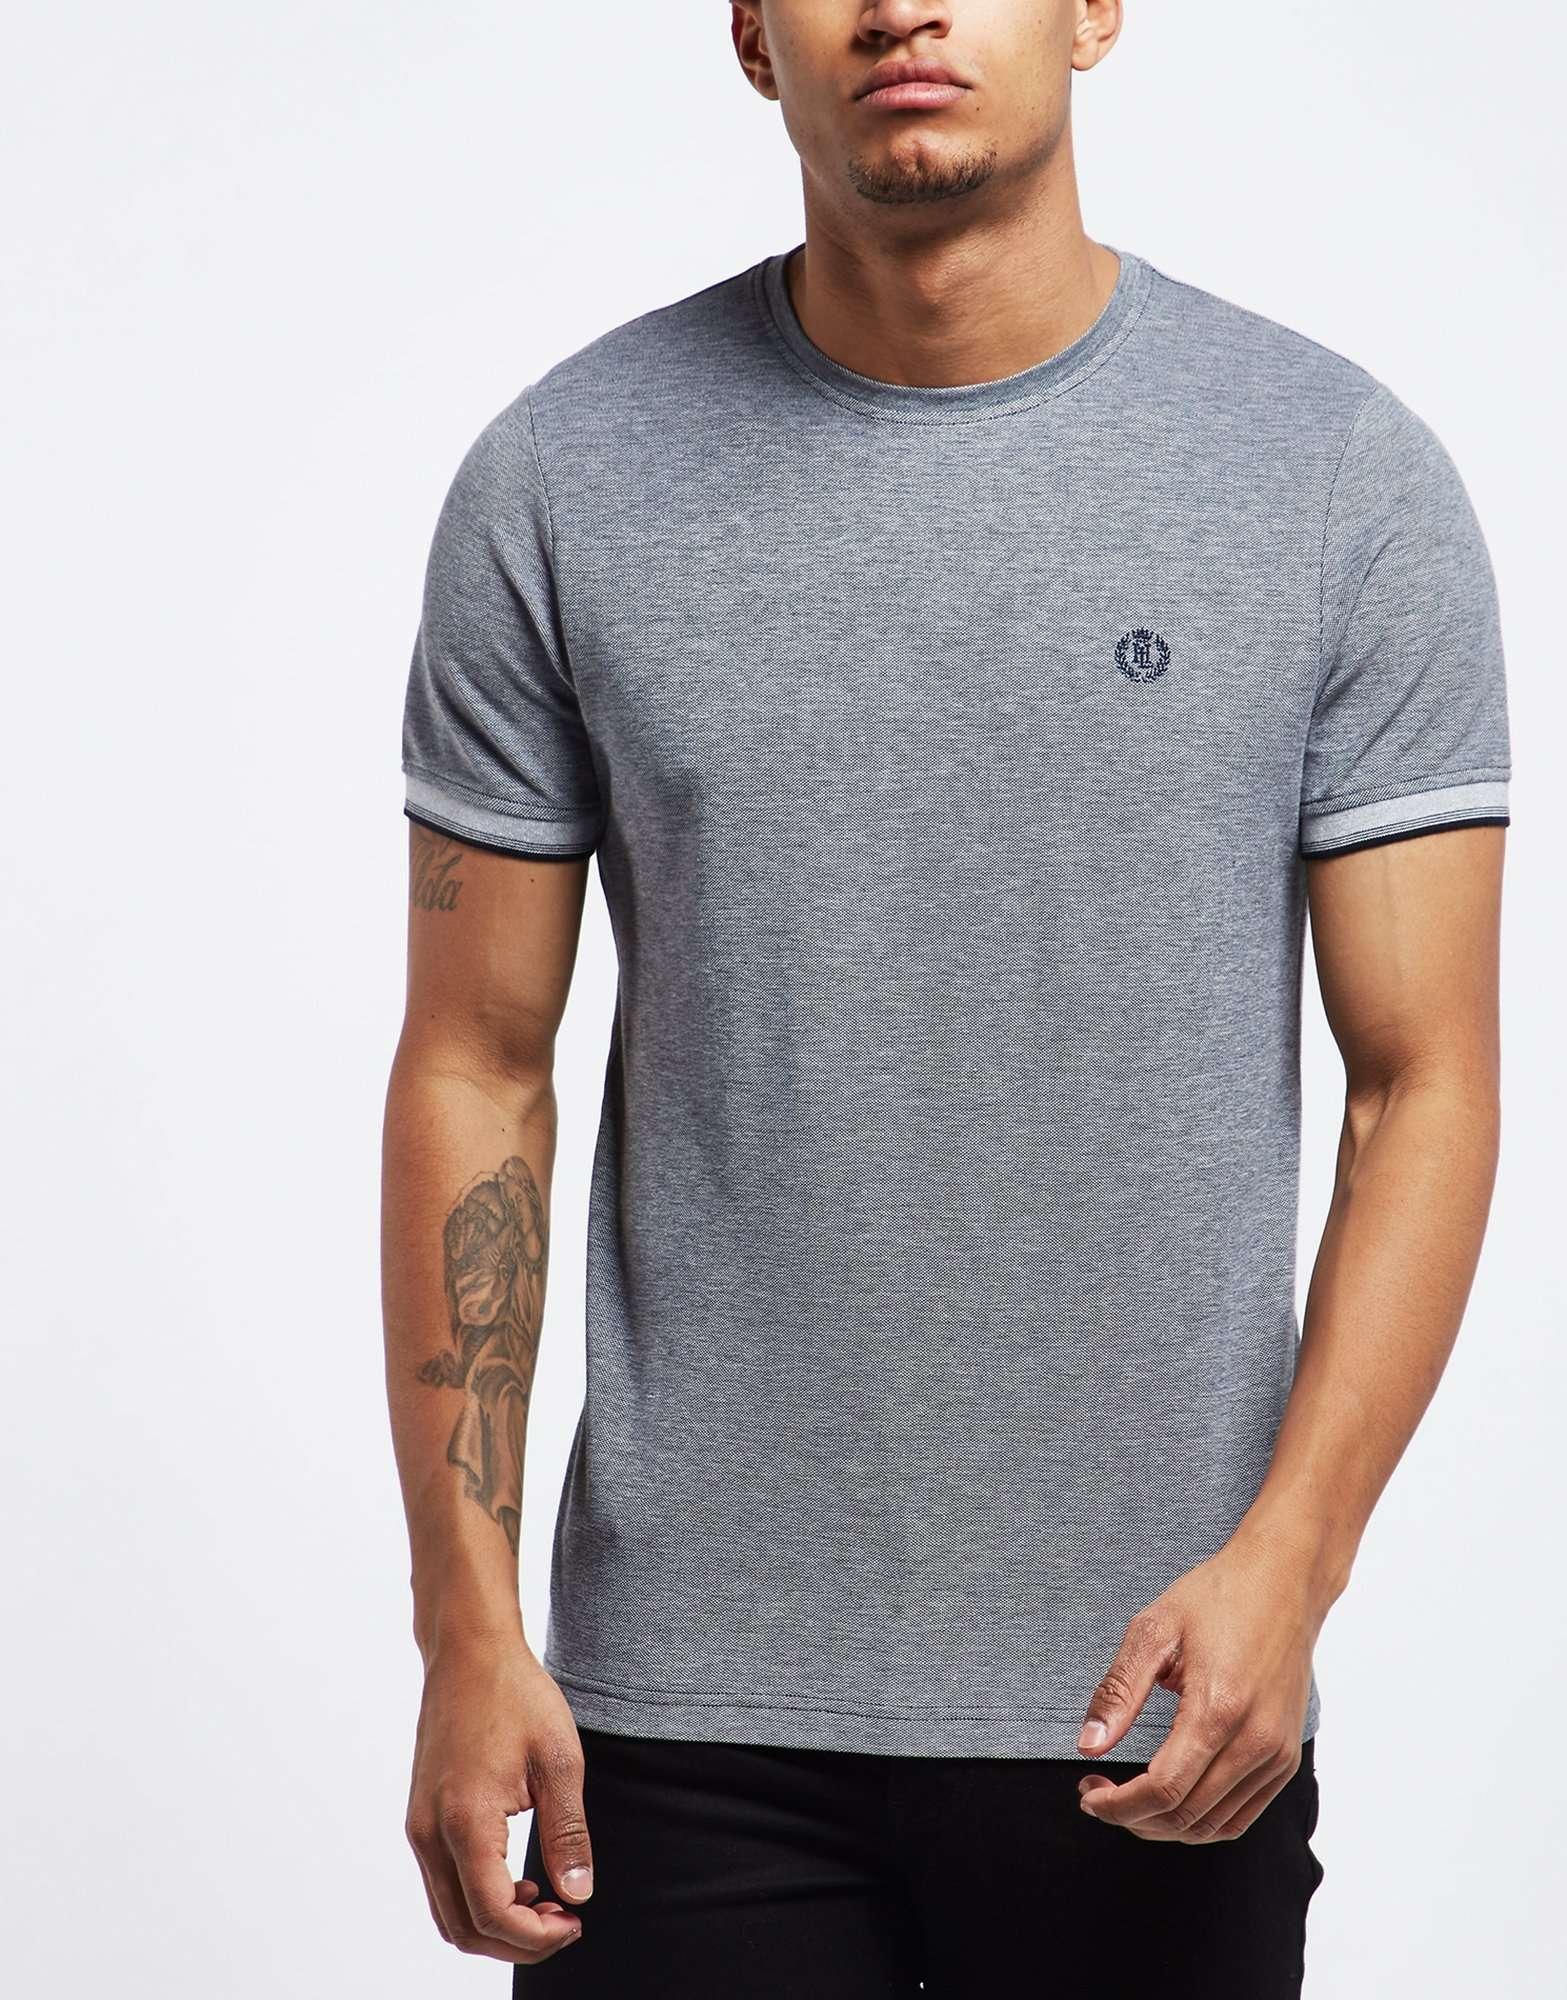 Henri Lloyd Lackan Oxford Pique Short Sleeve T-Shirt